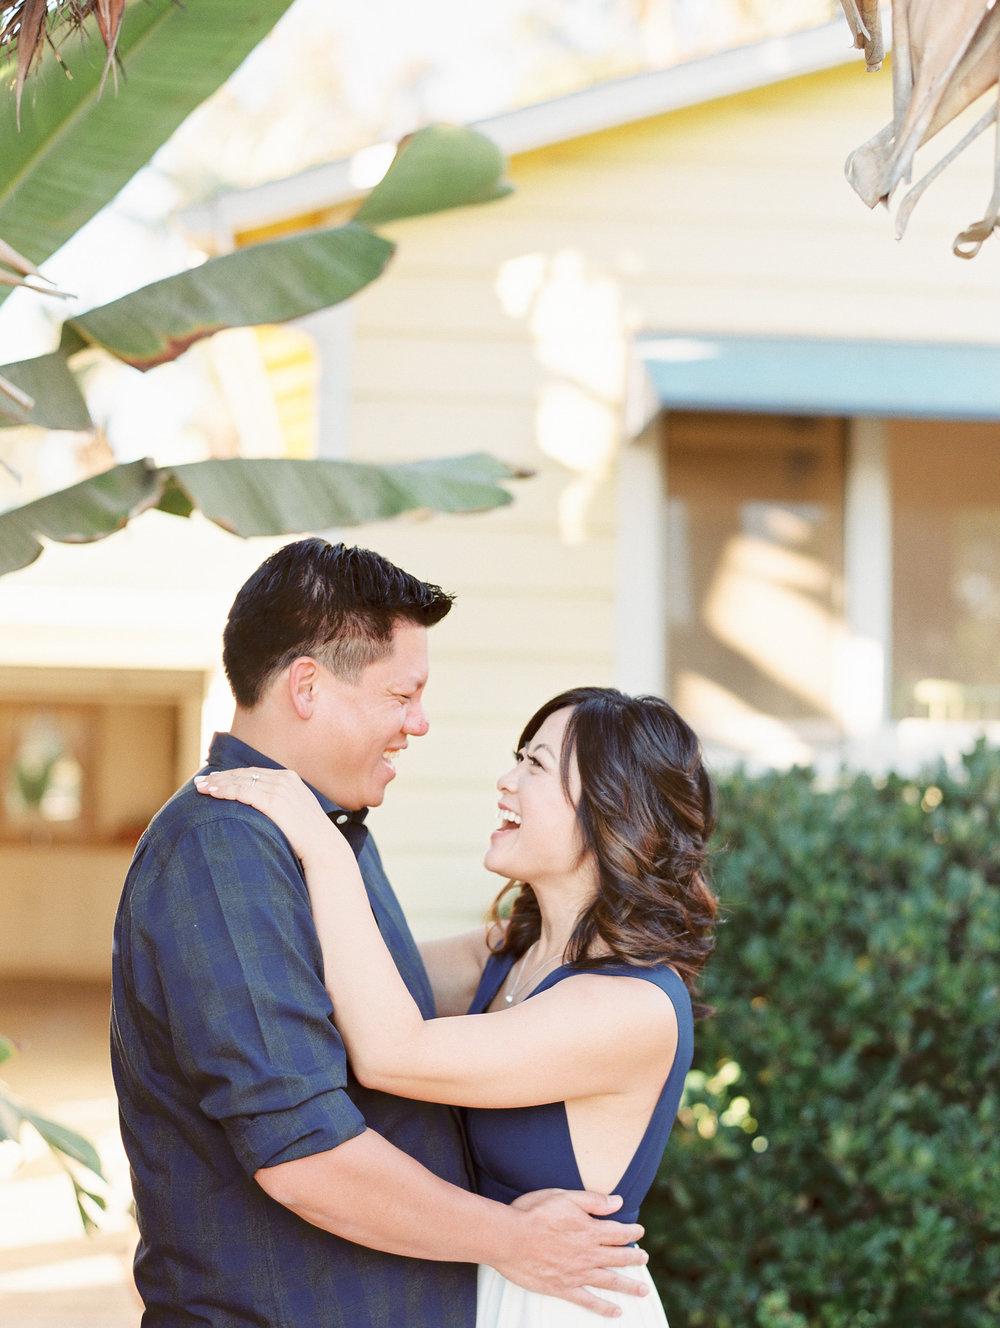 Crystal-Cove-Engagement-Kristina-Adams-5.jpg